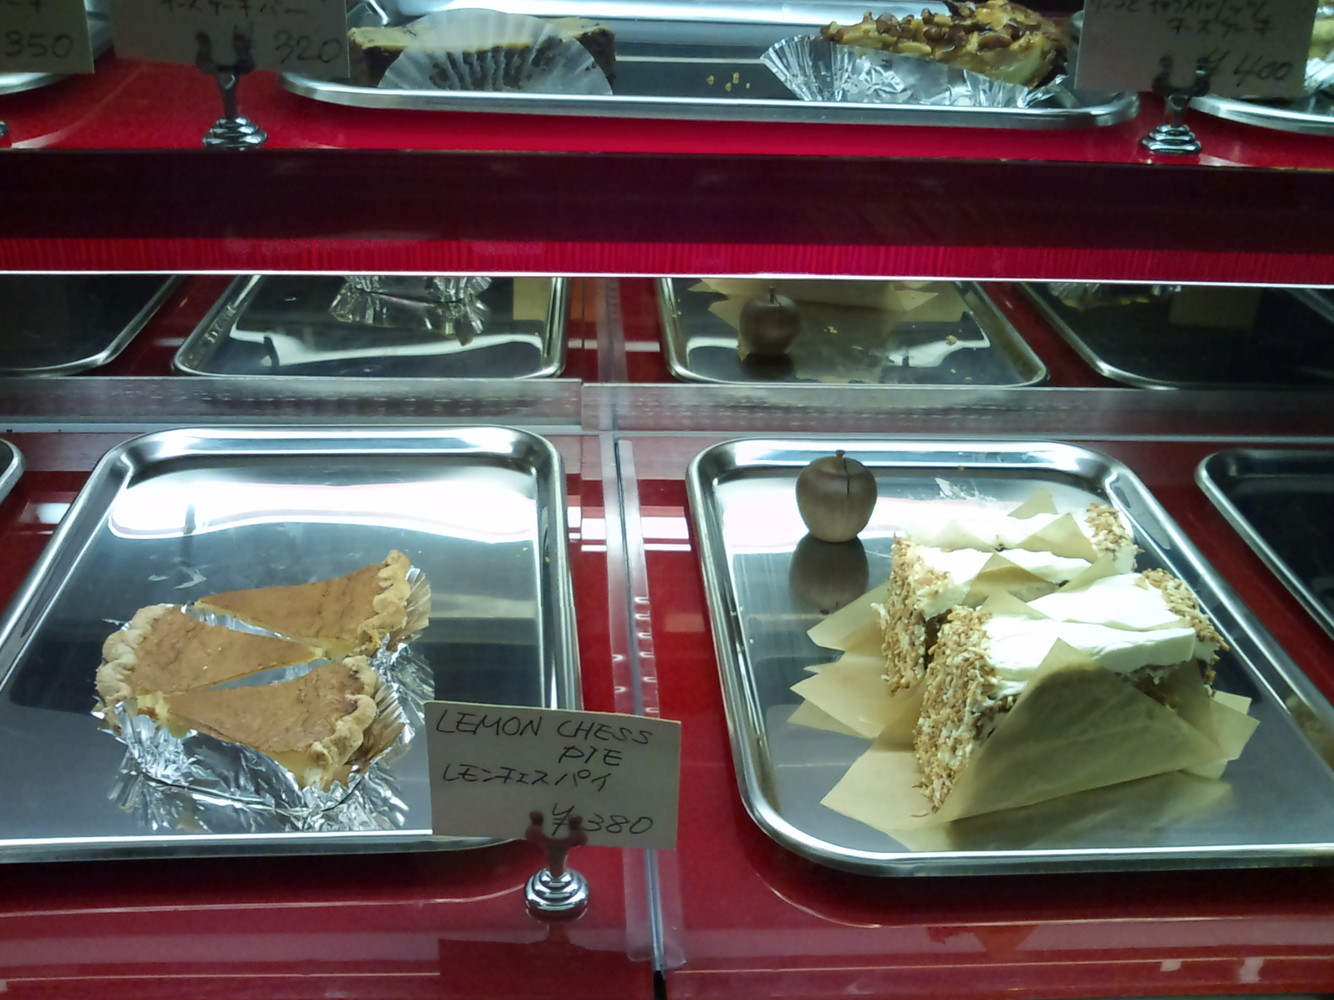 Dread Naught BAKE SHOP